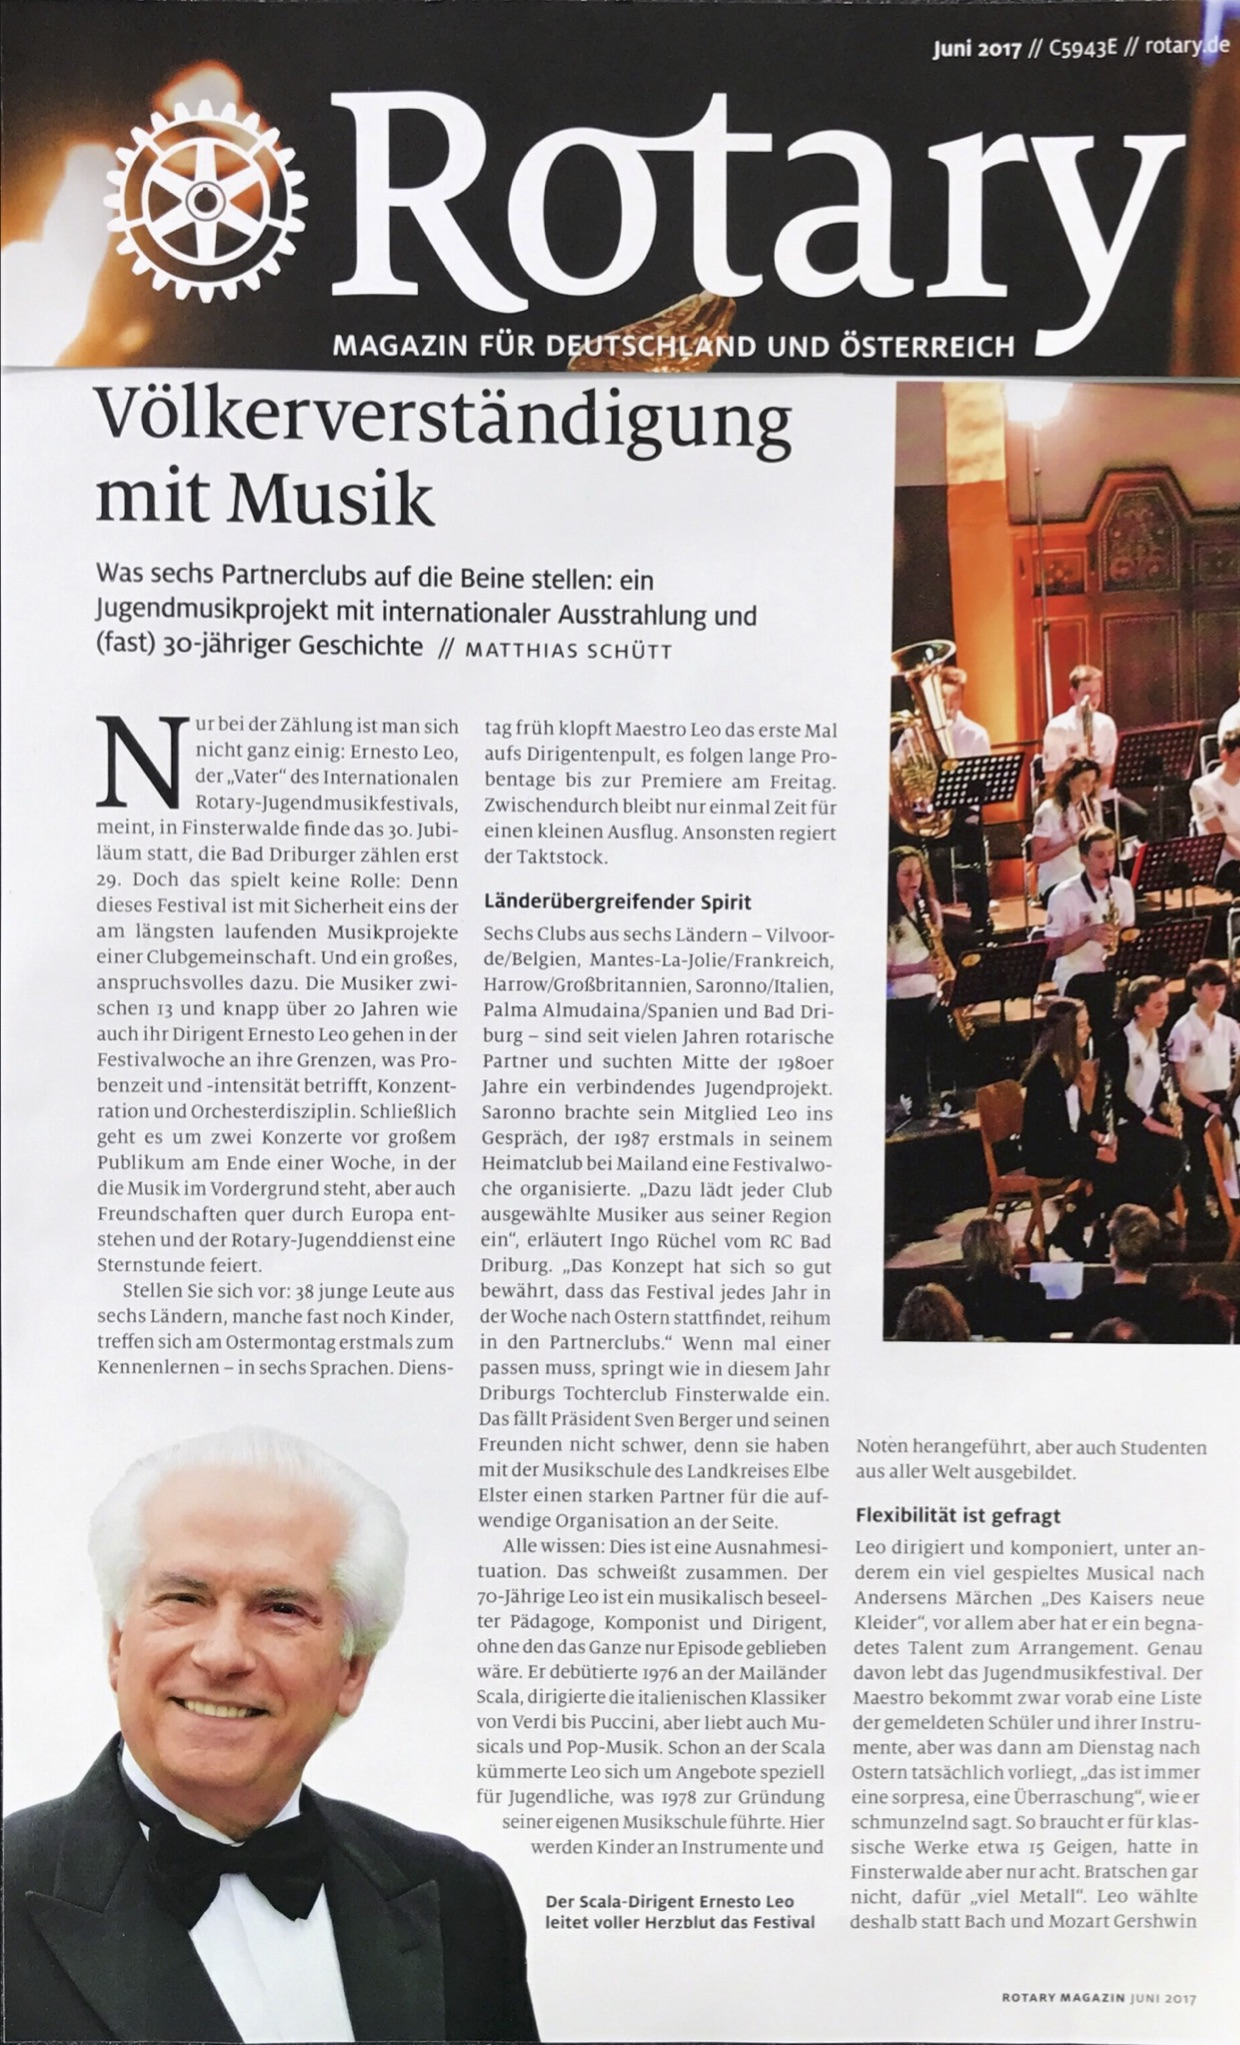 1 Rotary Magazin Bericht Jugendmusikfestival Finsterwalde 062017